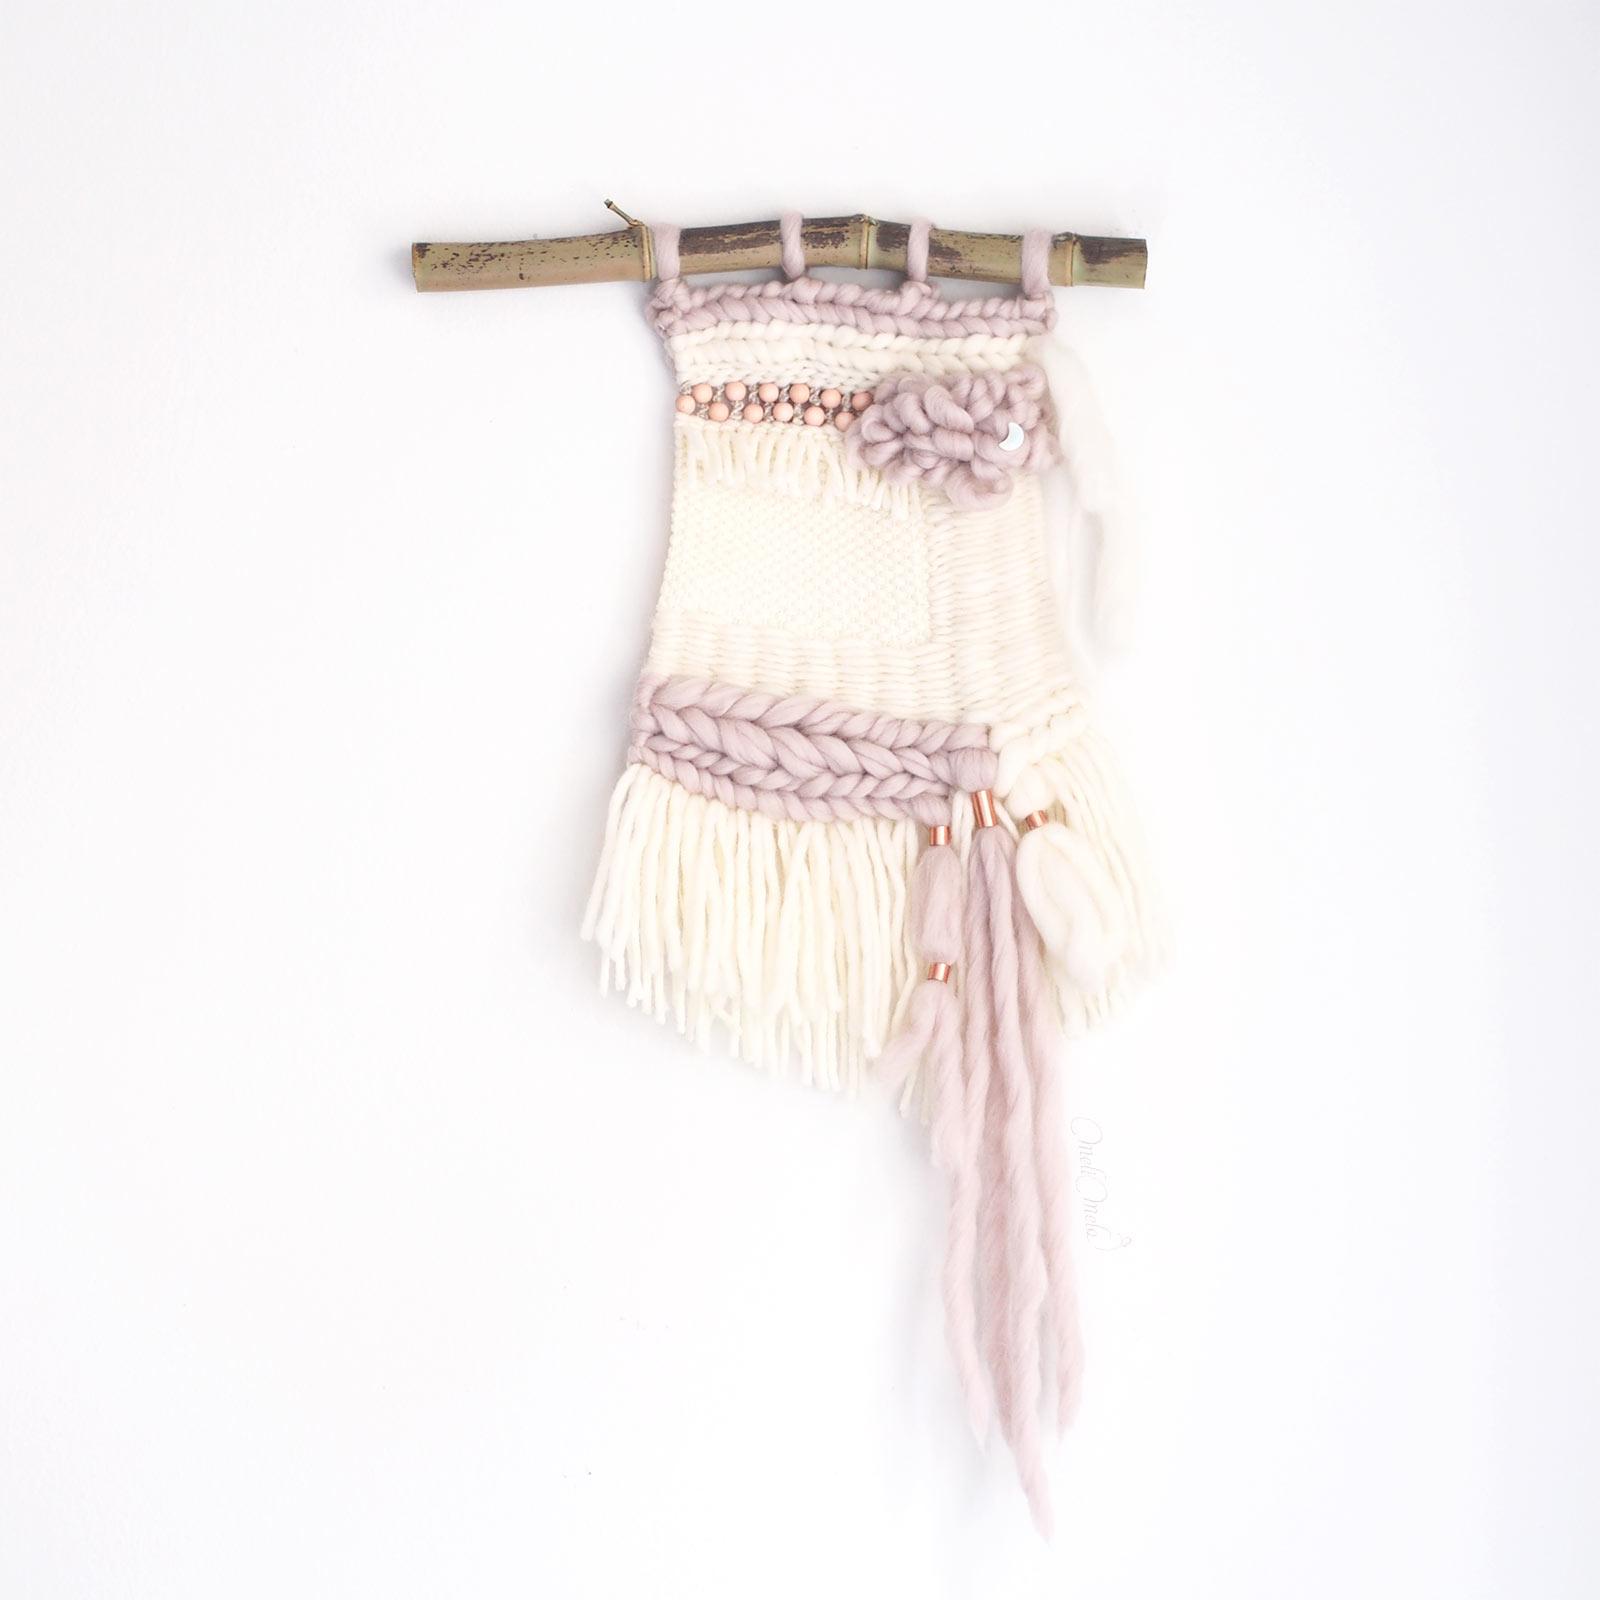 tissage laine cuivre perle lune weareknitters wool laboutiquedemelimelo